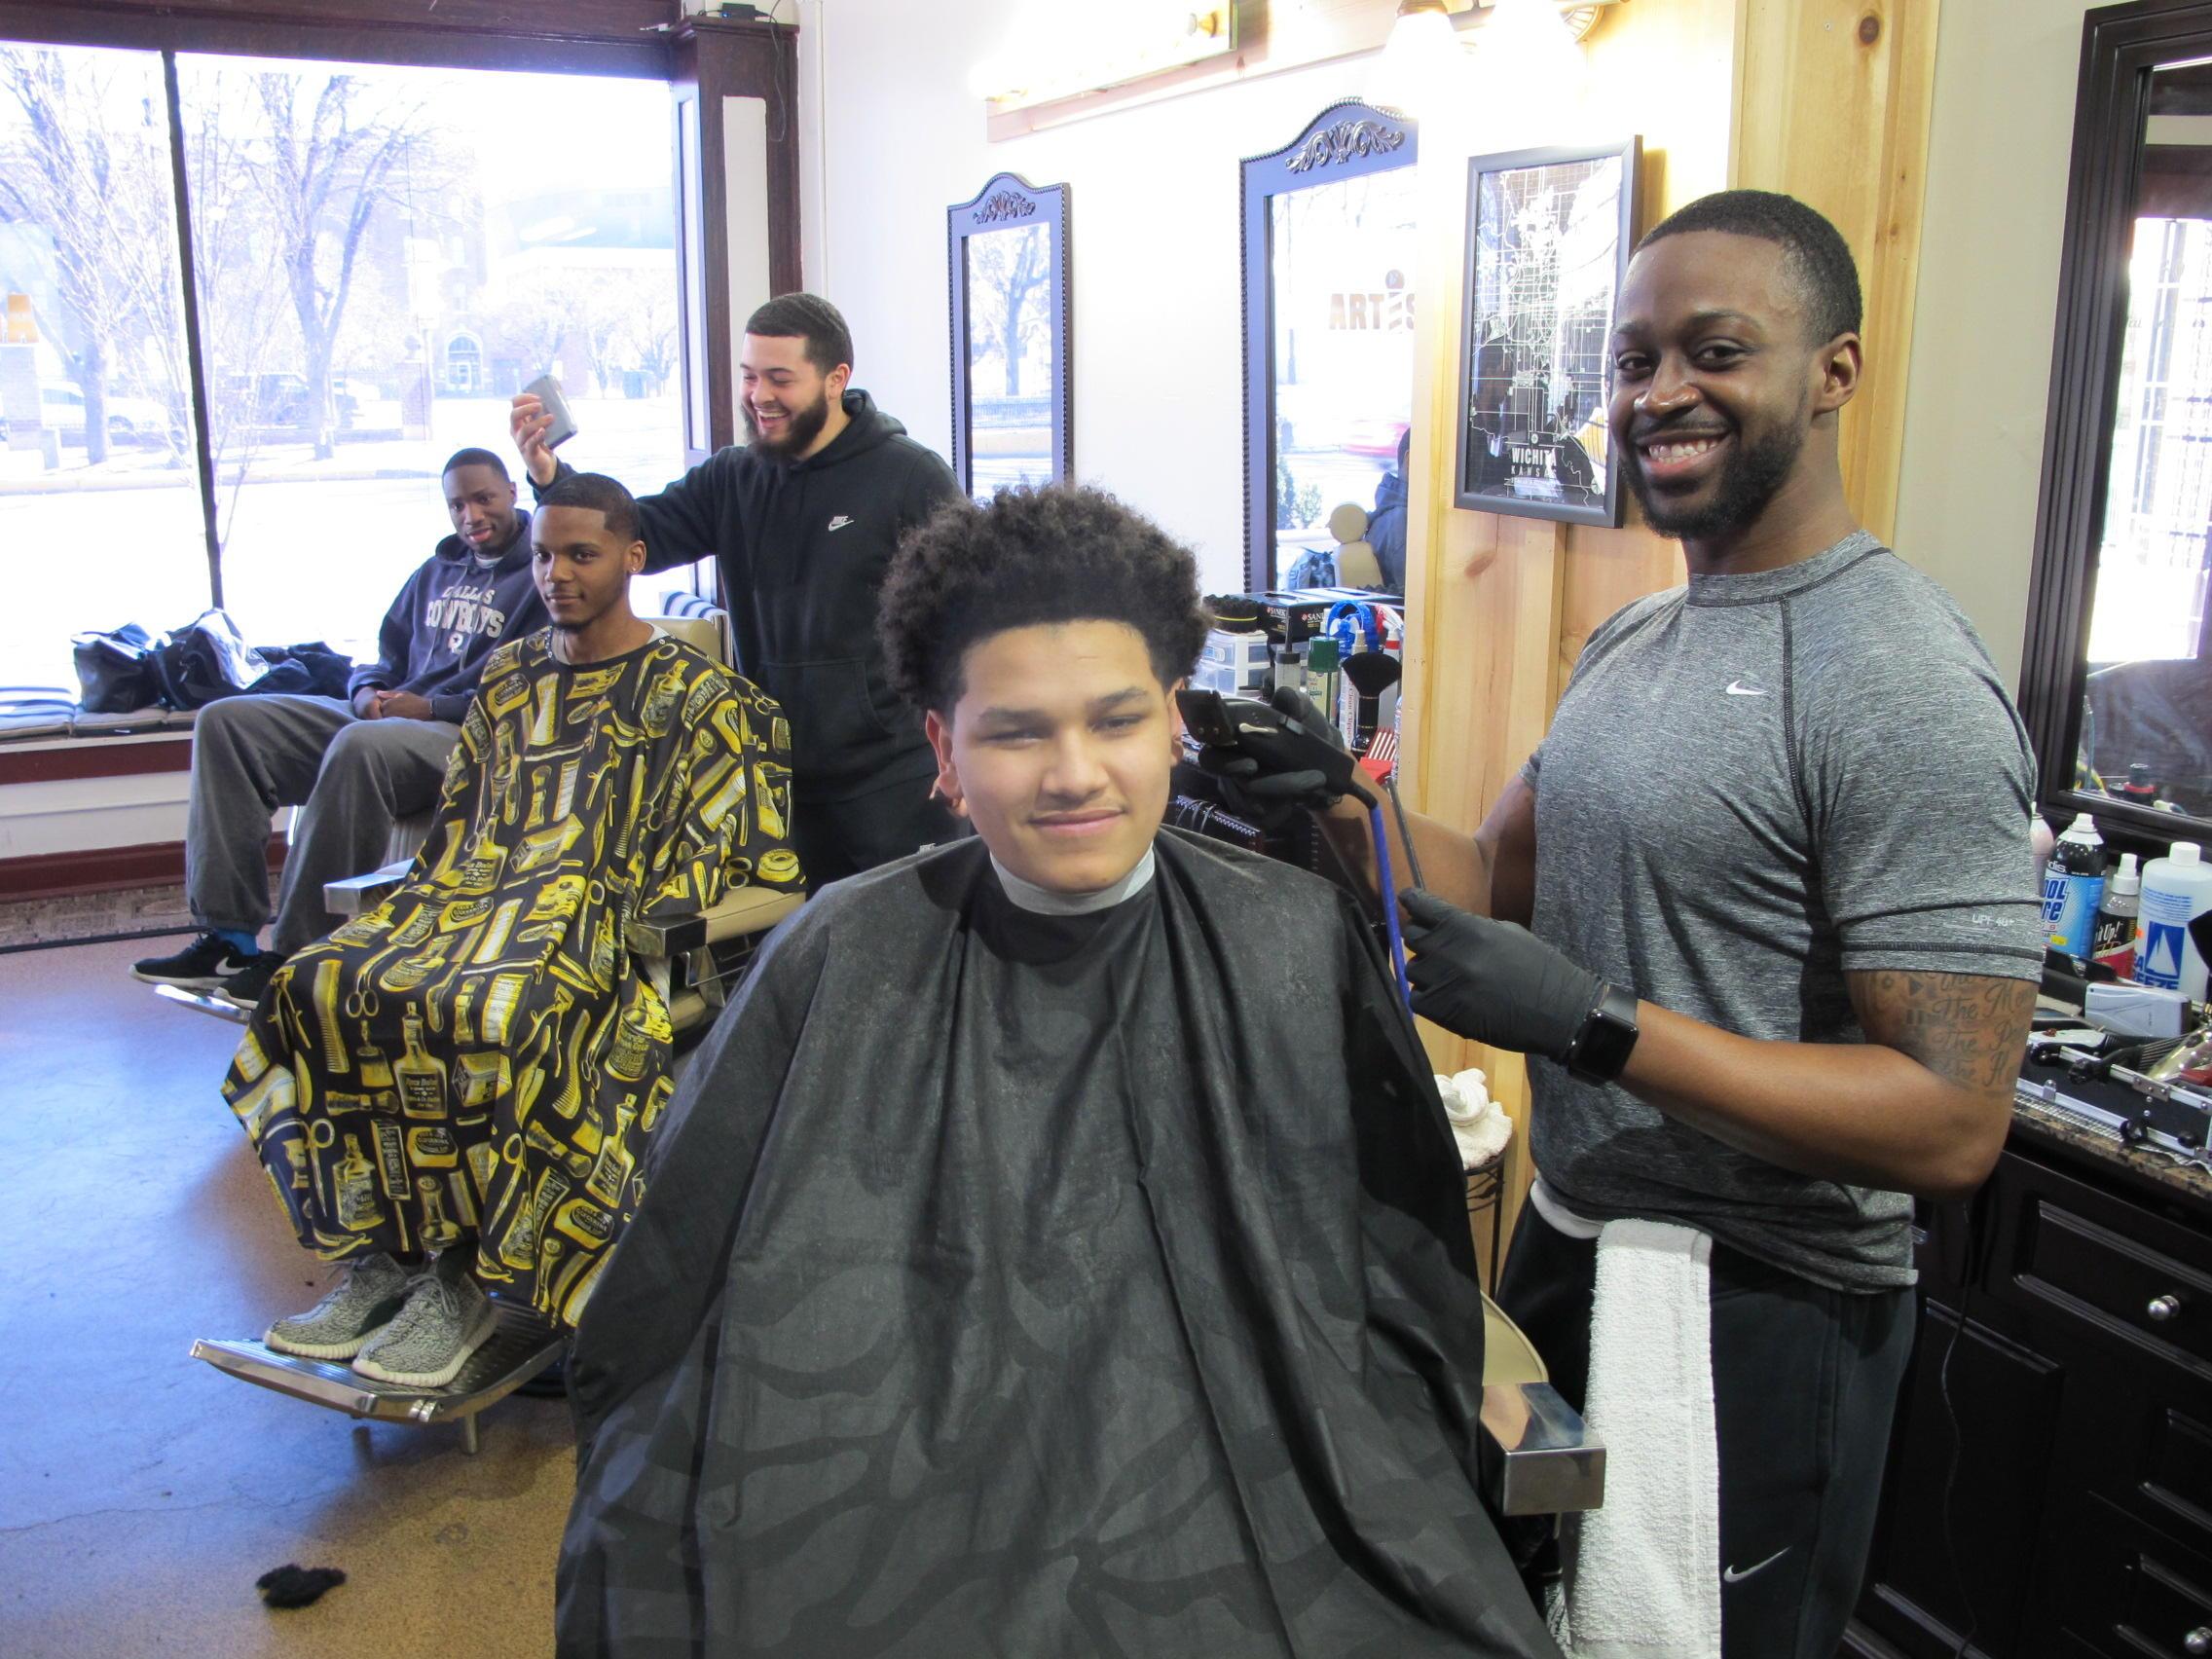 Hot Towels And Tapered Cuts Local Barbershop Wel es NCAA